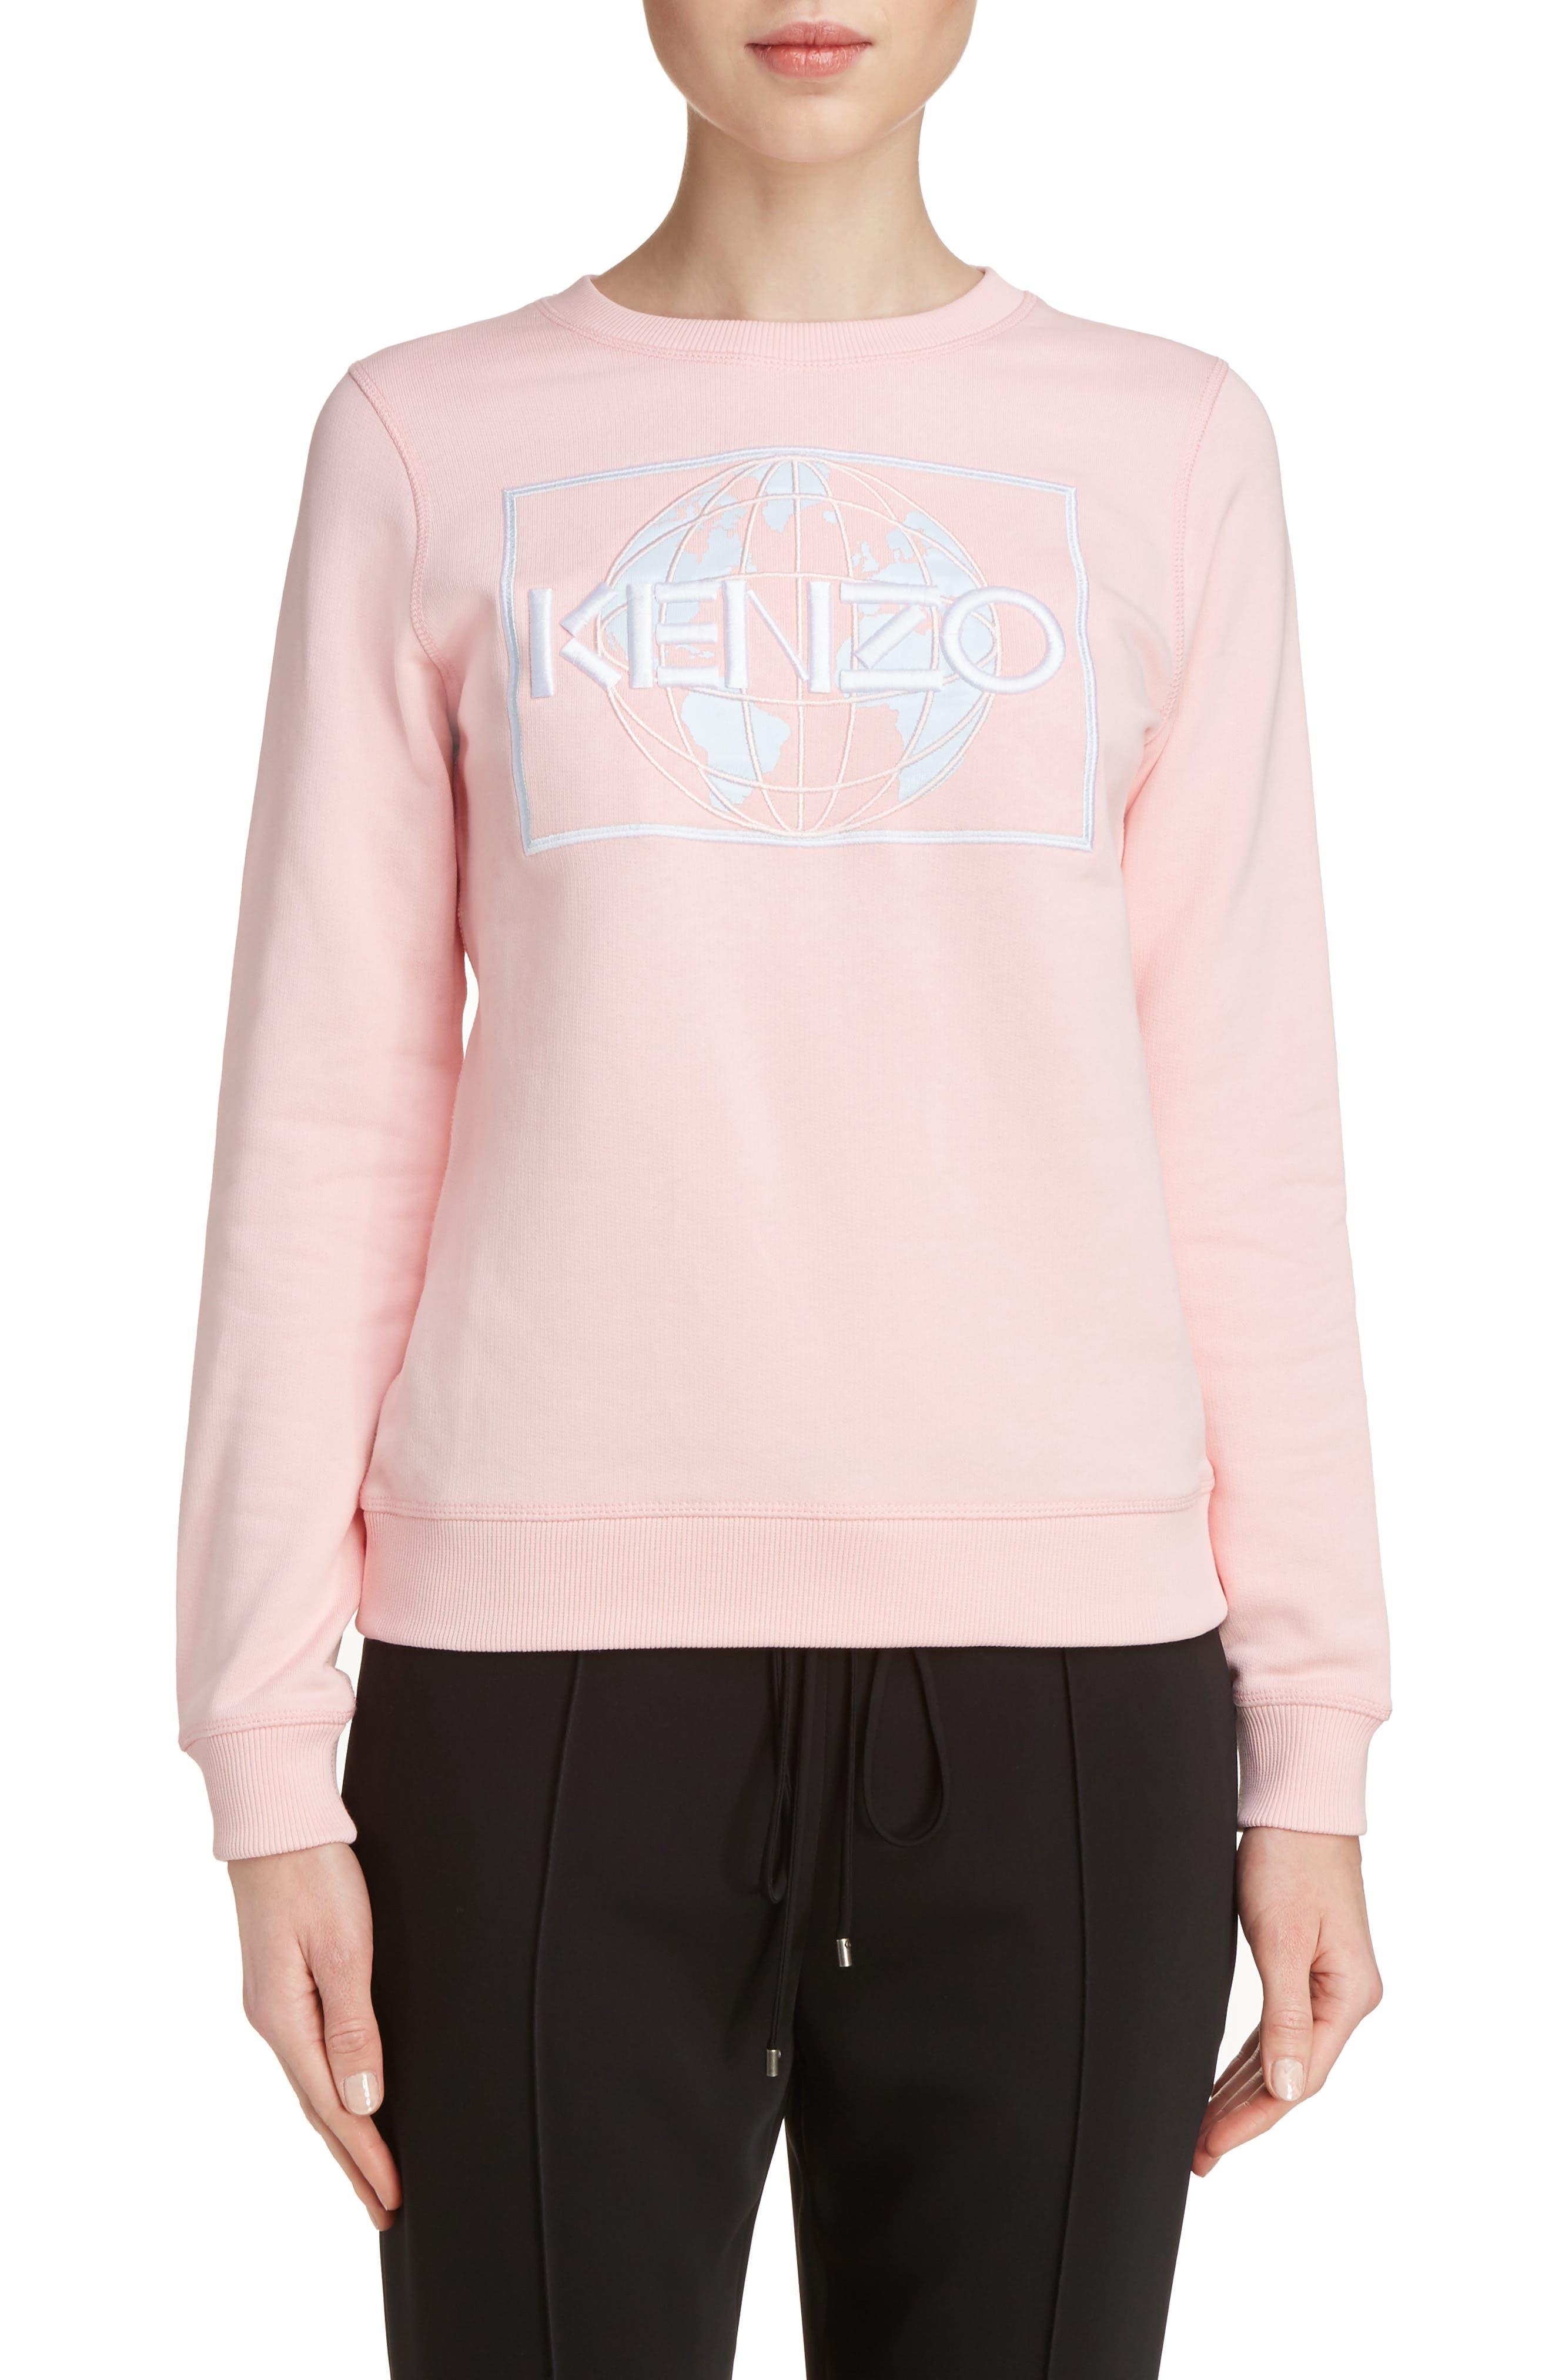 Main Image - KENZO Embroidered Cotton Sweatshirt